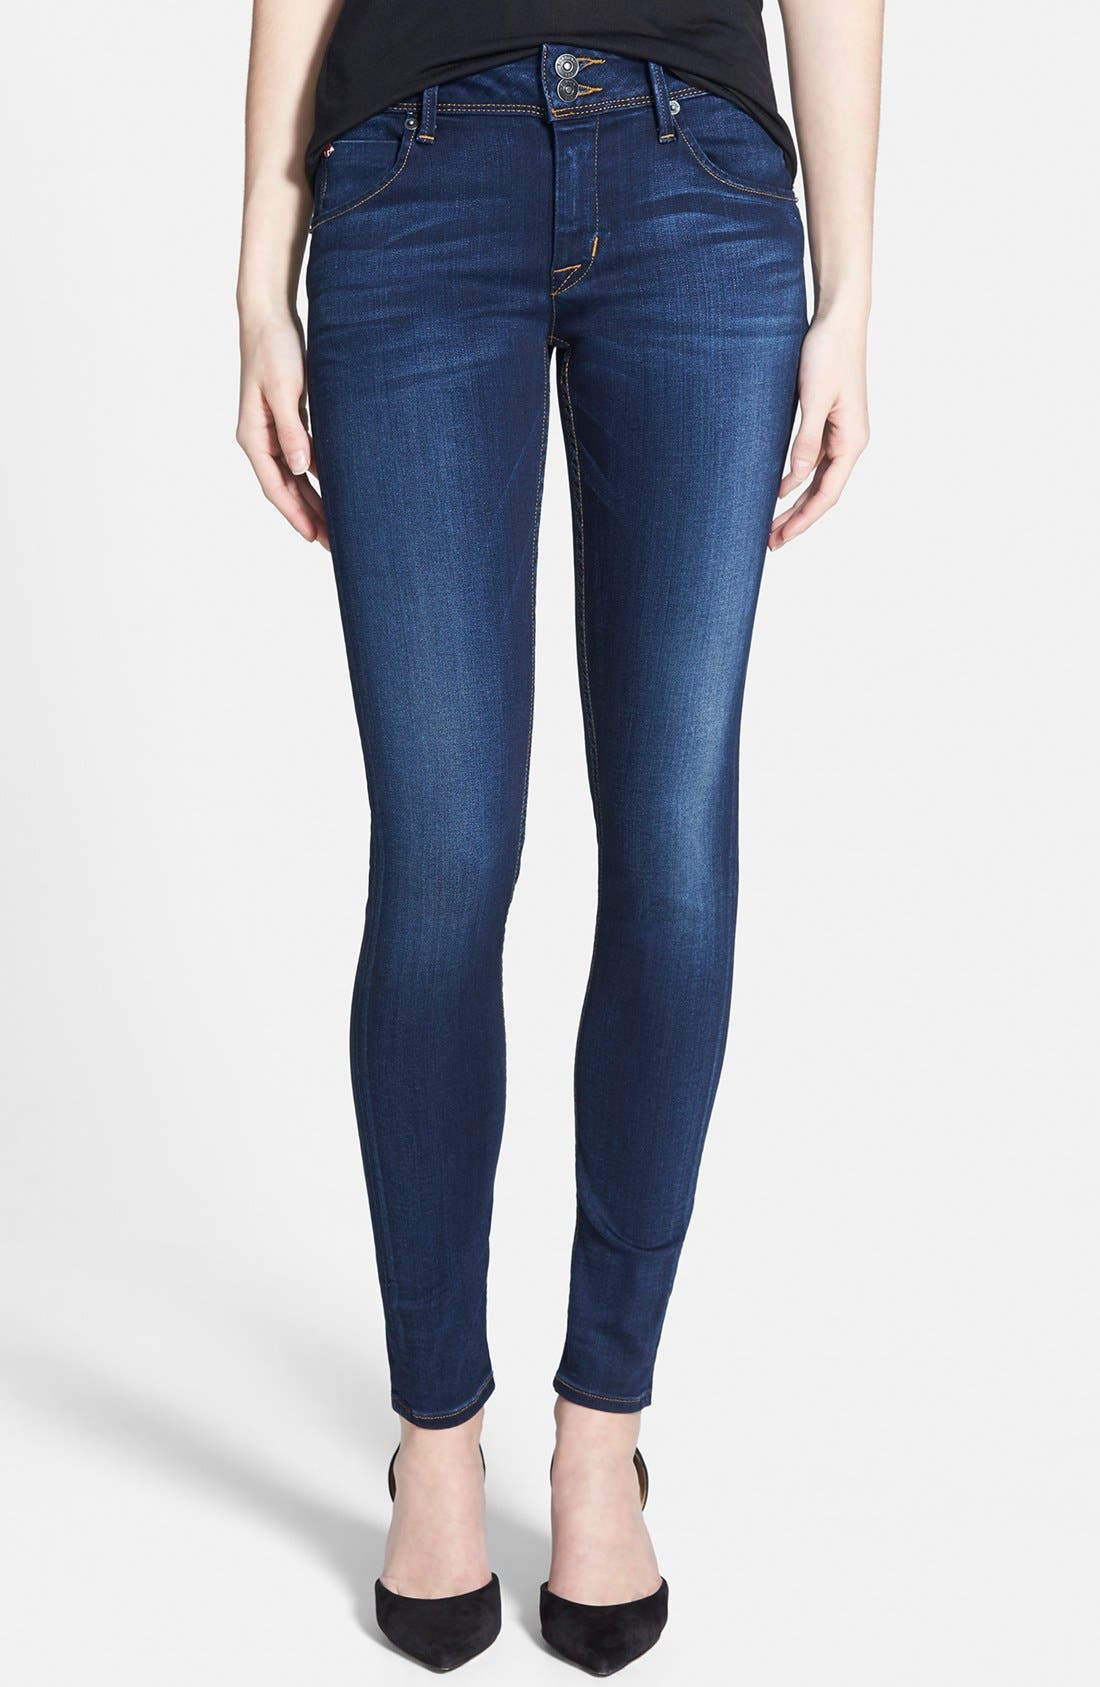 HUDSON JEANS 'Collin' Supermodel Skinny Jeans, Main, color, 423